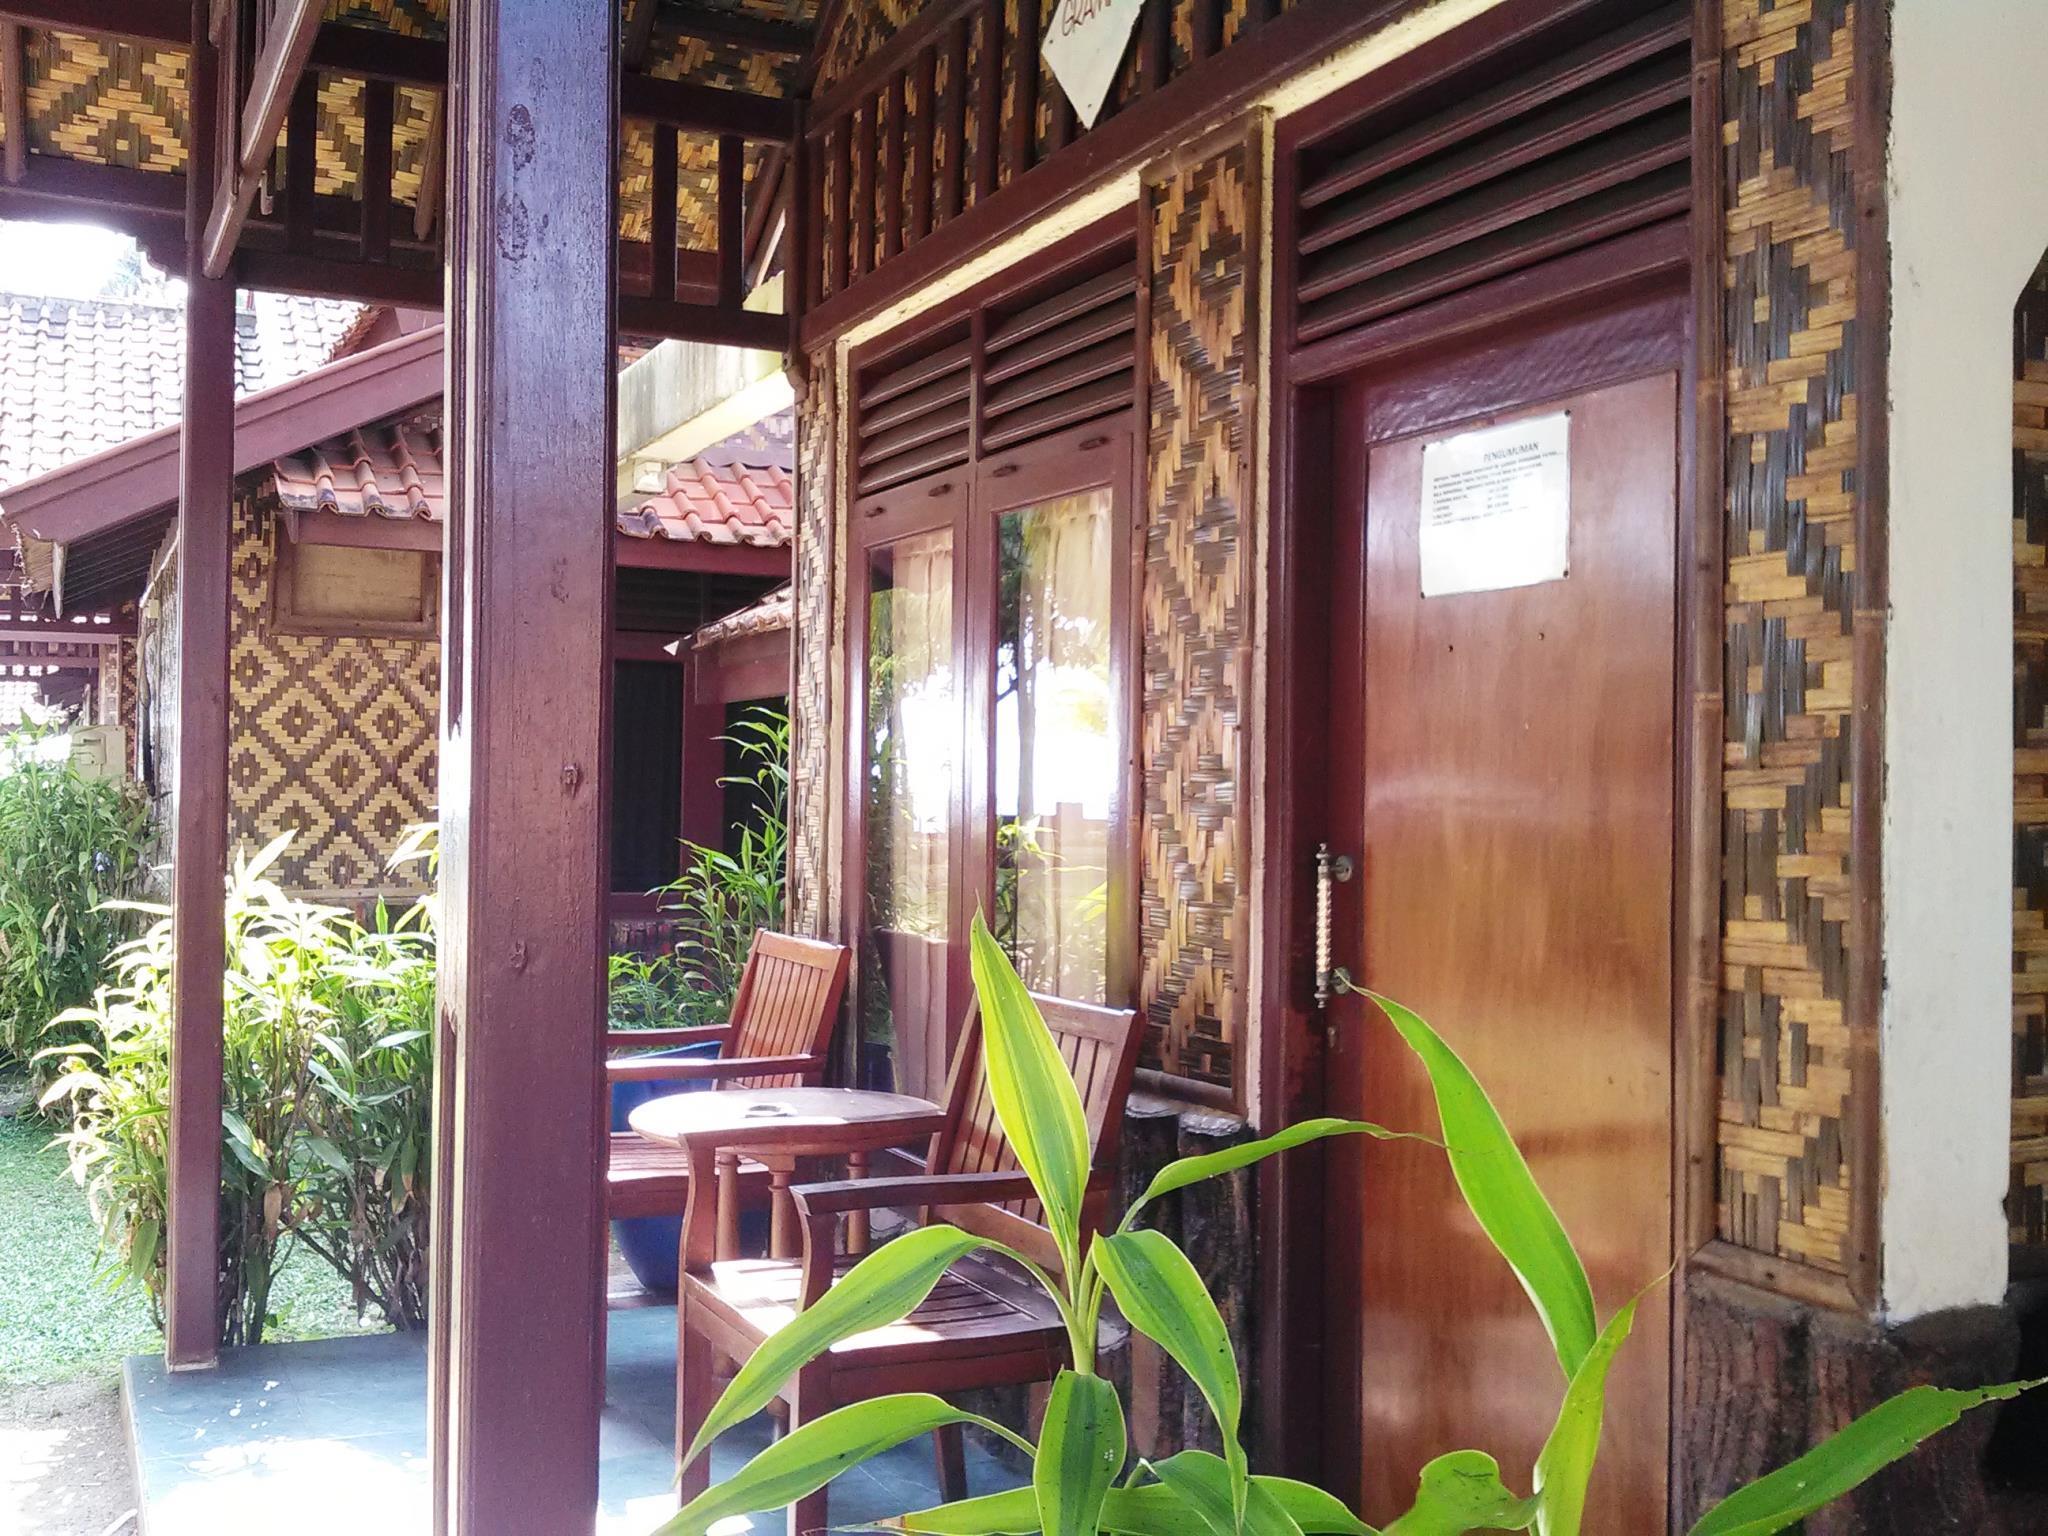 Wisma Kompas Gramedia Karang Bolong Anyer 0 Star Hotel In Voucher Marbella Convention And Spa Third Slide